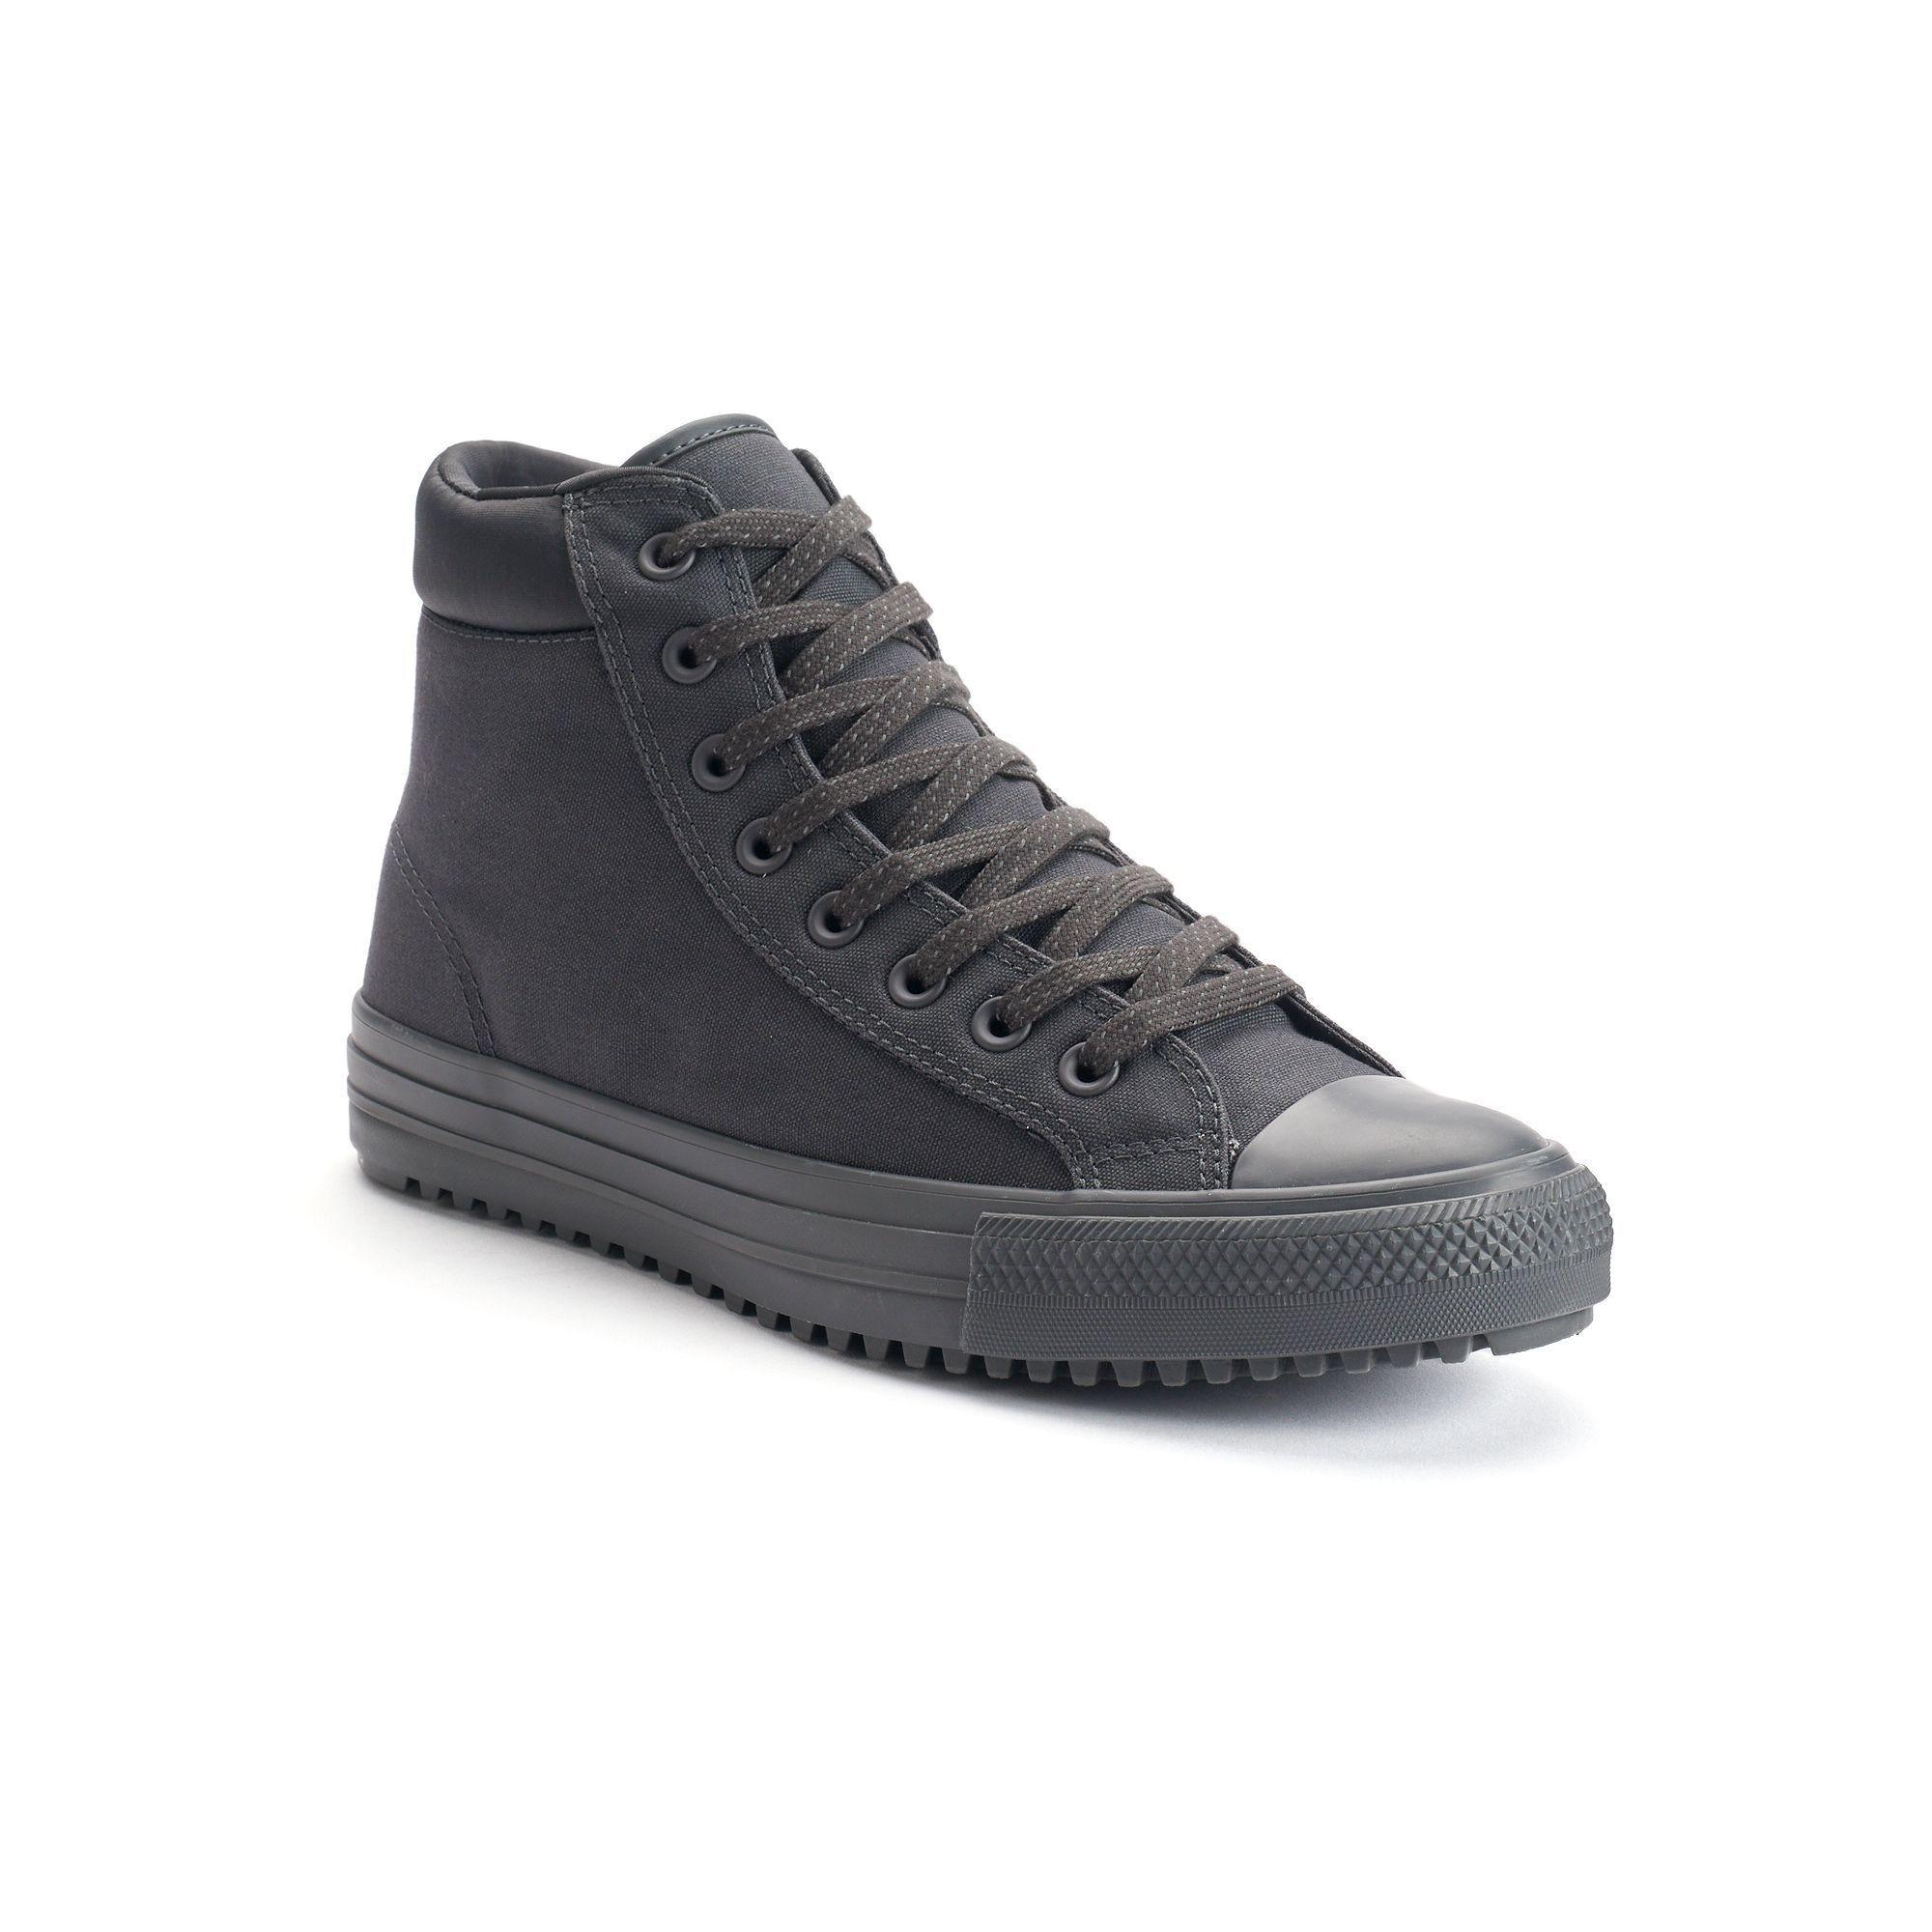 523e811d7251d Men s Converse Chuck Taylor All Star Water-Resistant Boots ...